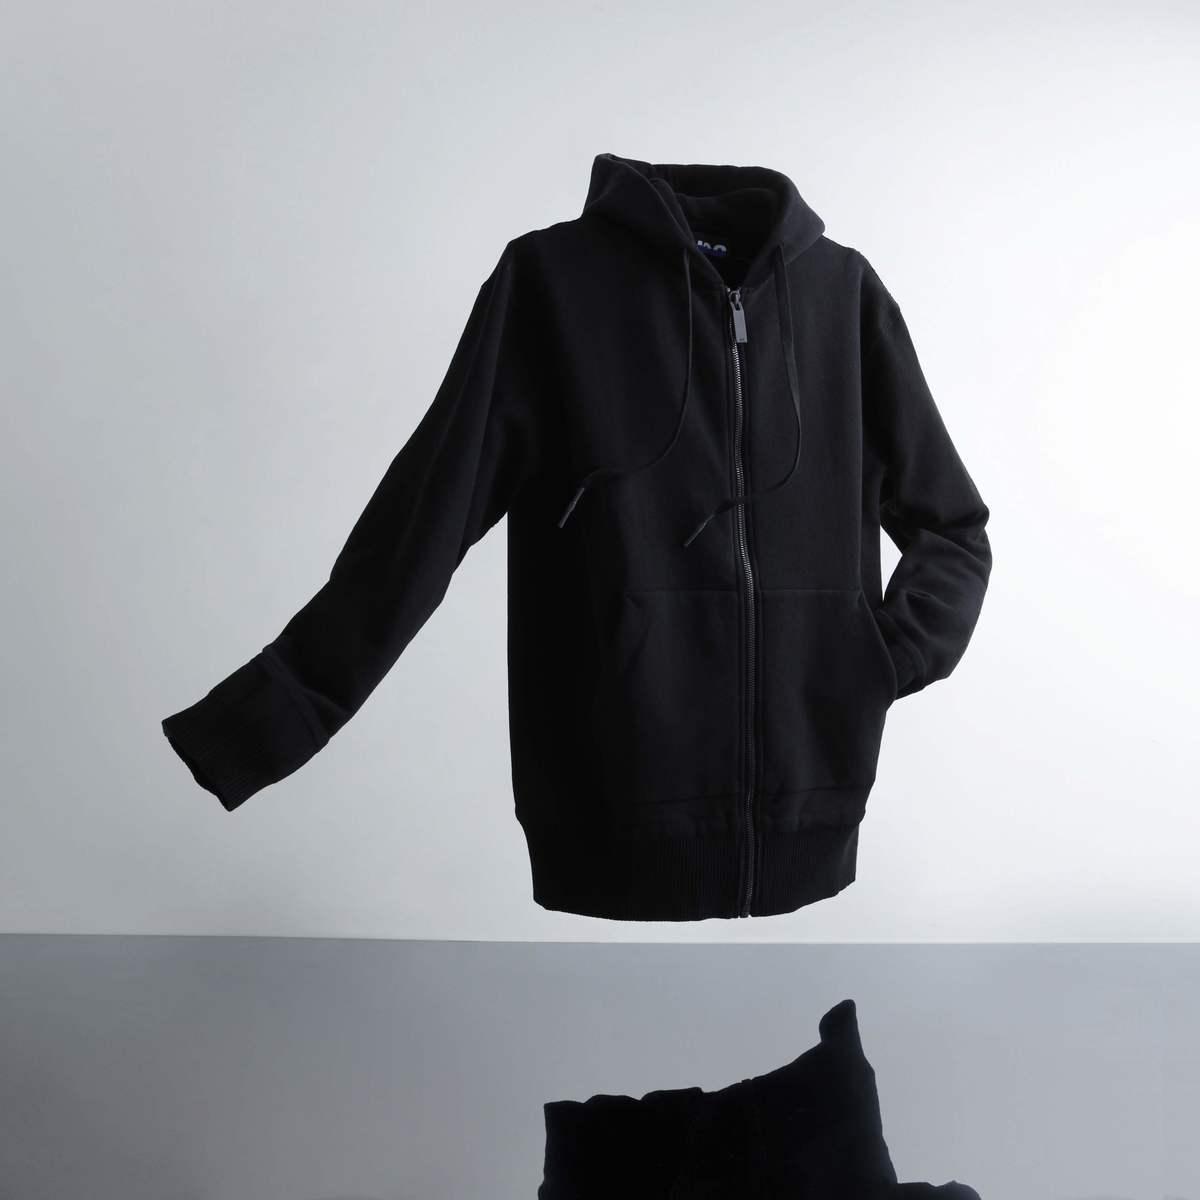 A-GIRLS ATMOS Pinnacle Zip Up Hoodie (エイガールズ アトモス ピナクル ジップアップ フーディー) BLACK【メンズ パーカー】19SS-S